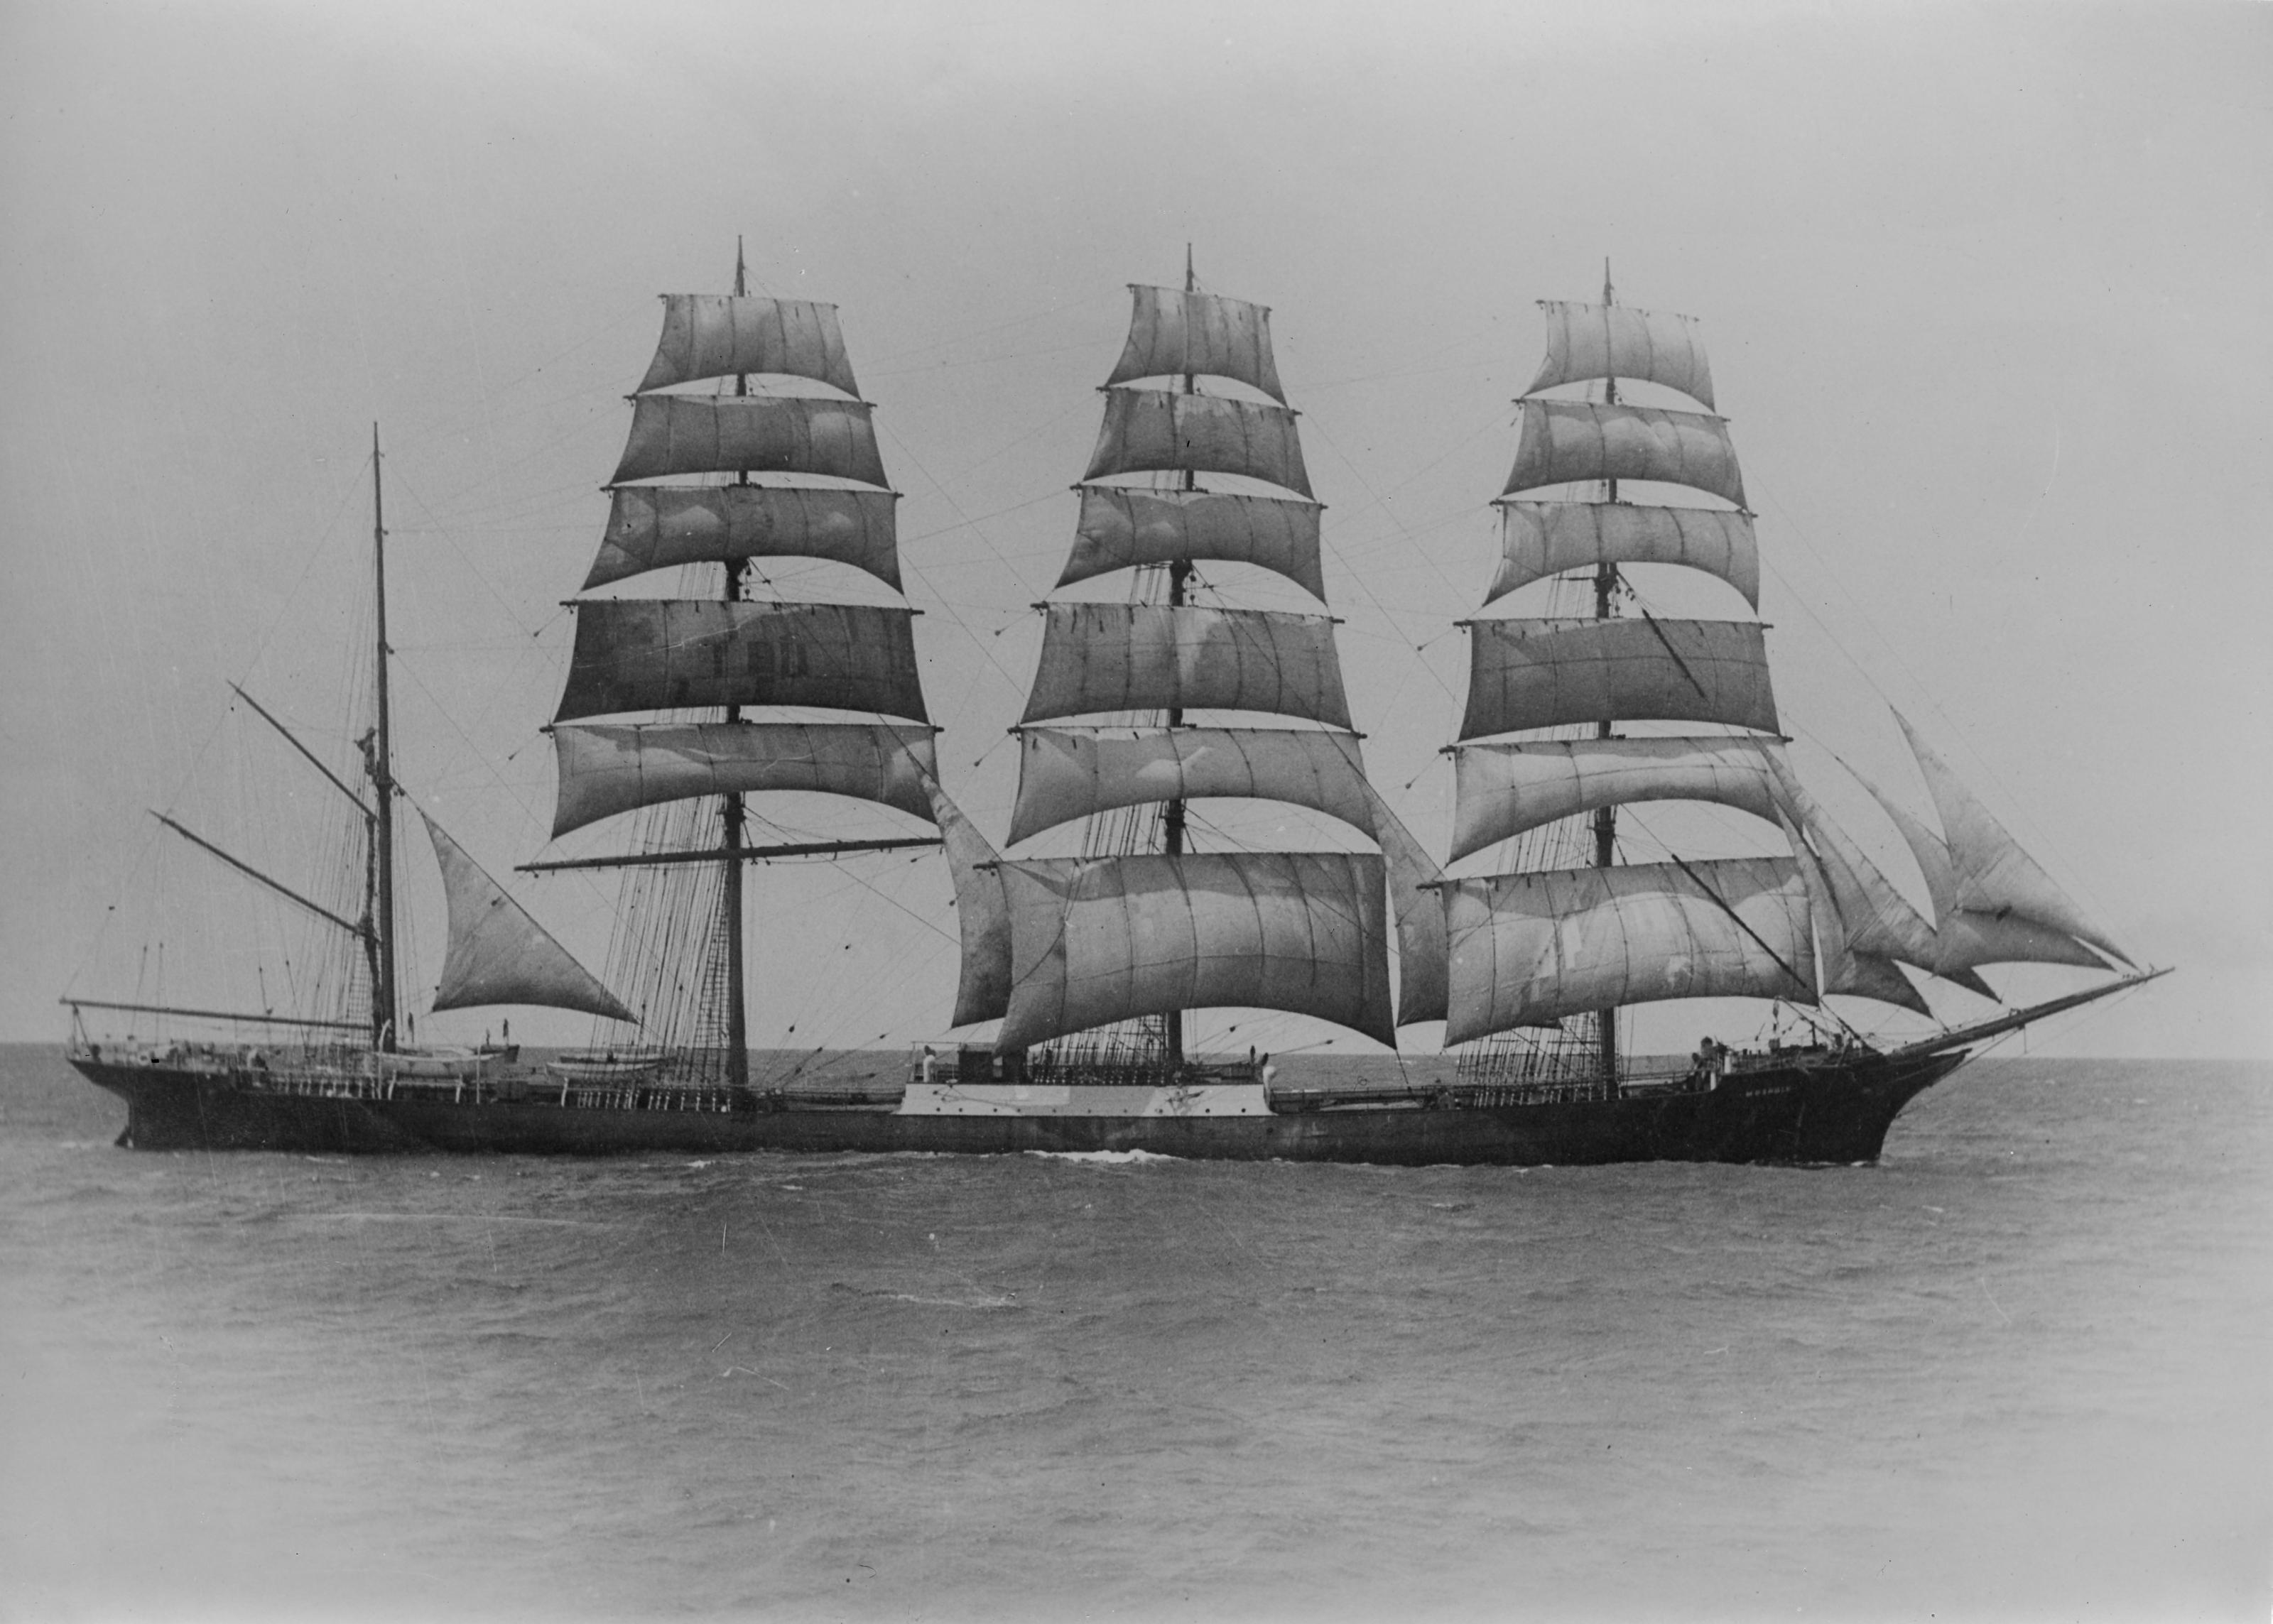 Moshulu_(ship,_1904)_-_SLV_H91.250-725.jpg